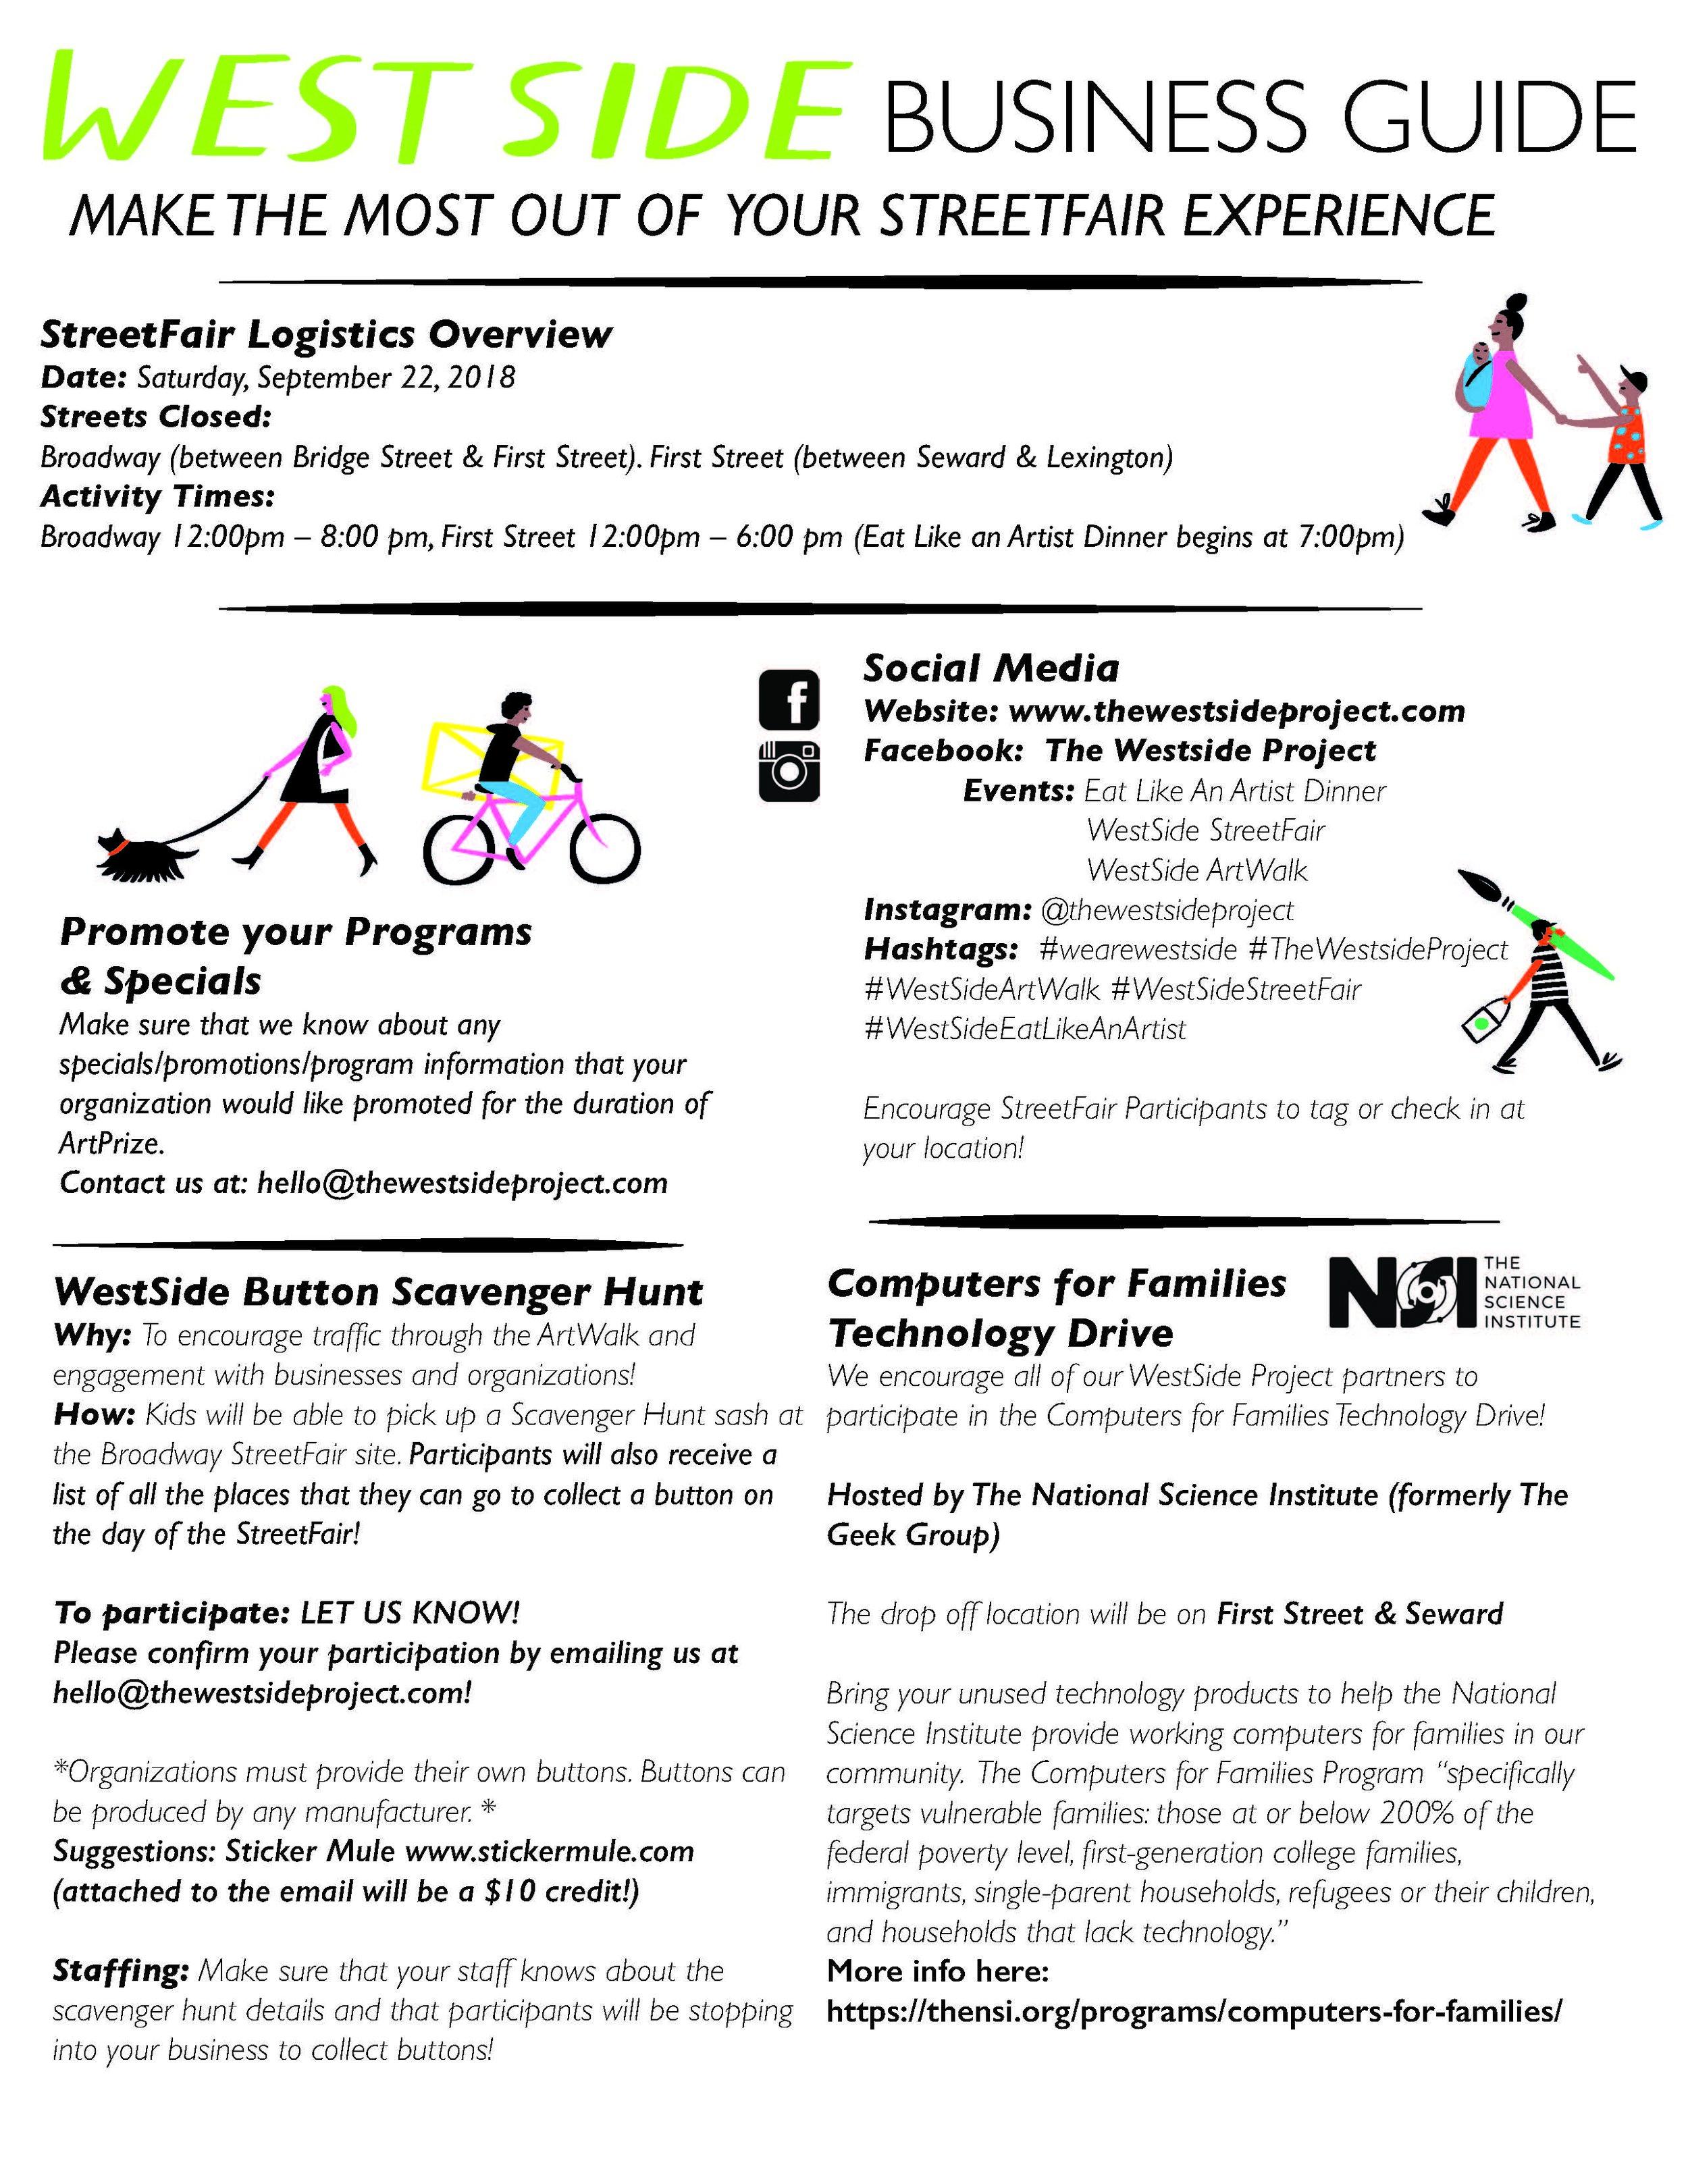 WSP Business Guide (1).jpg